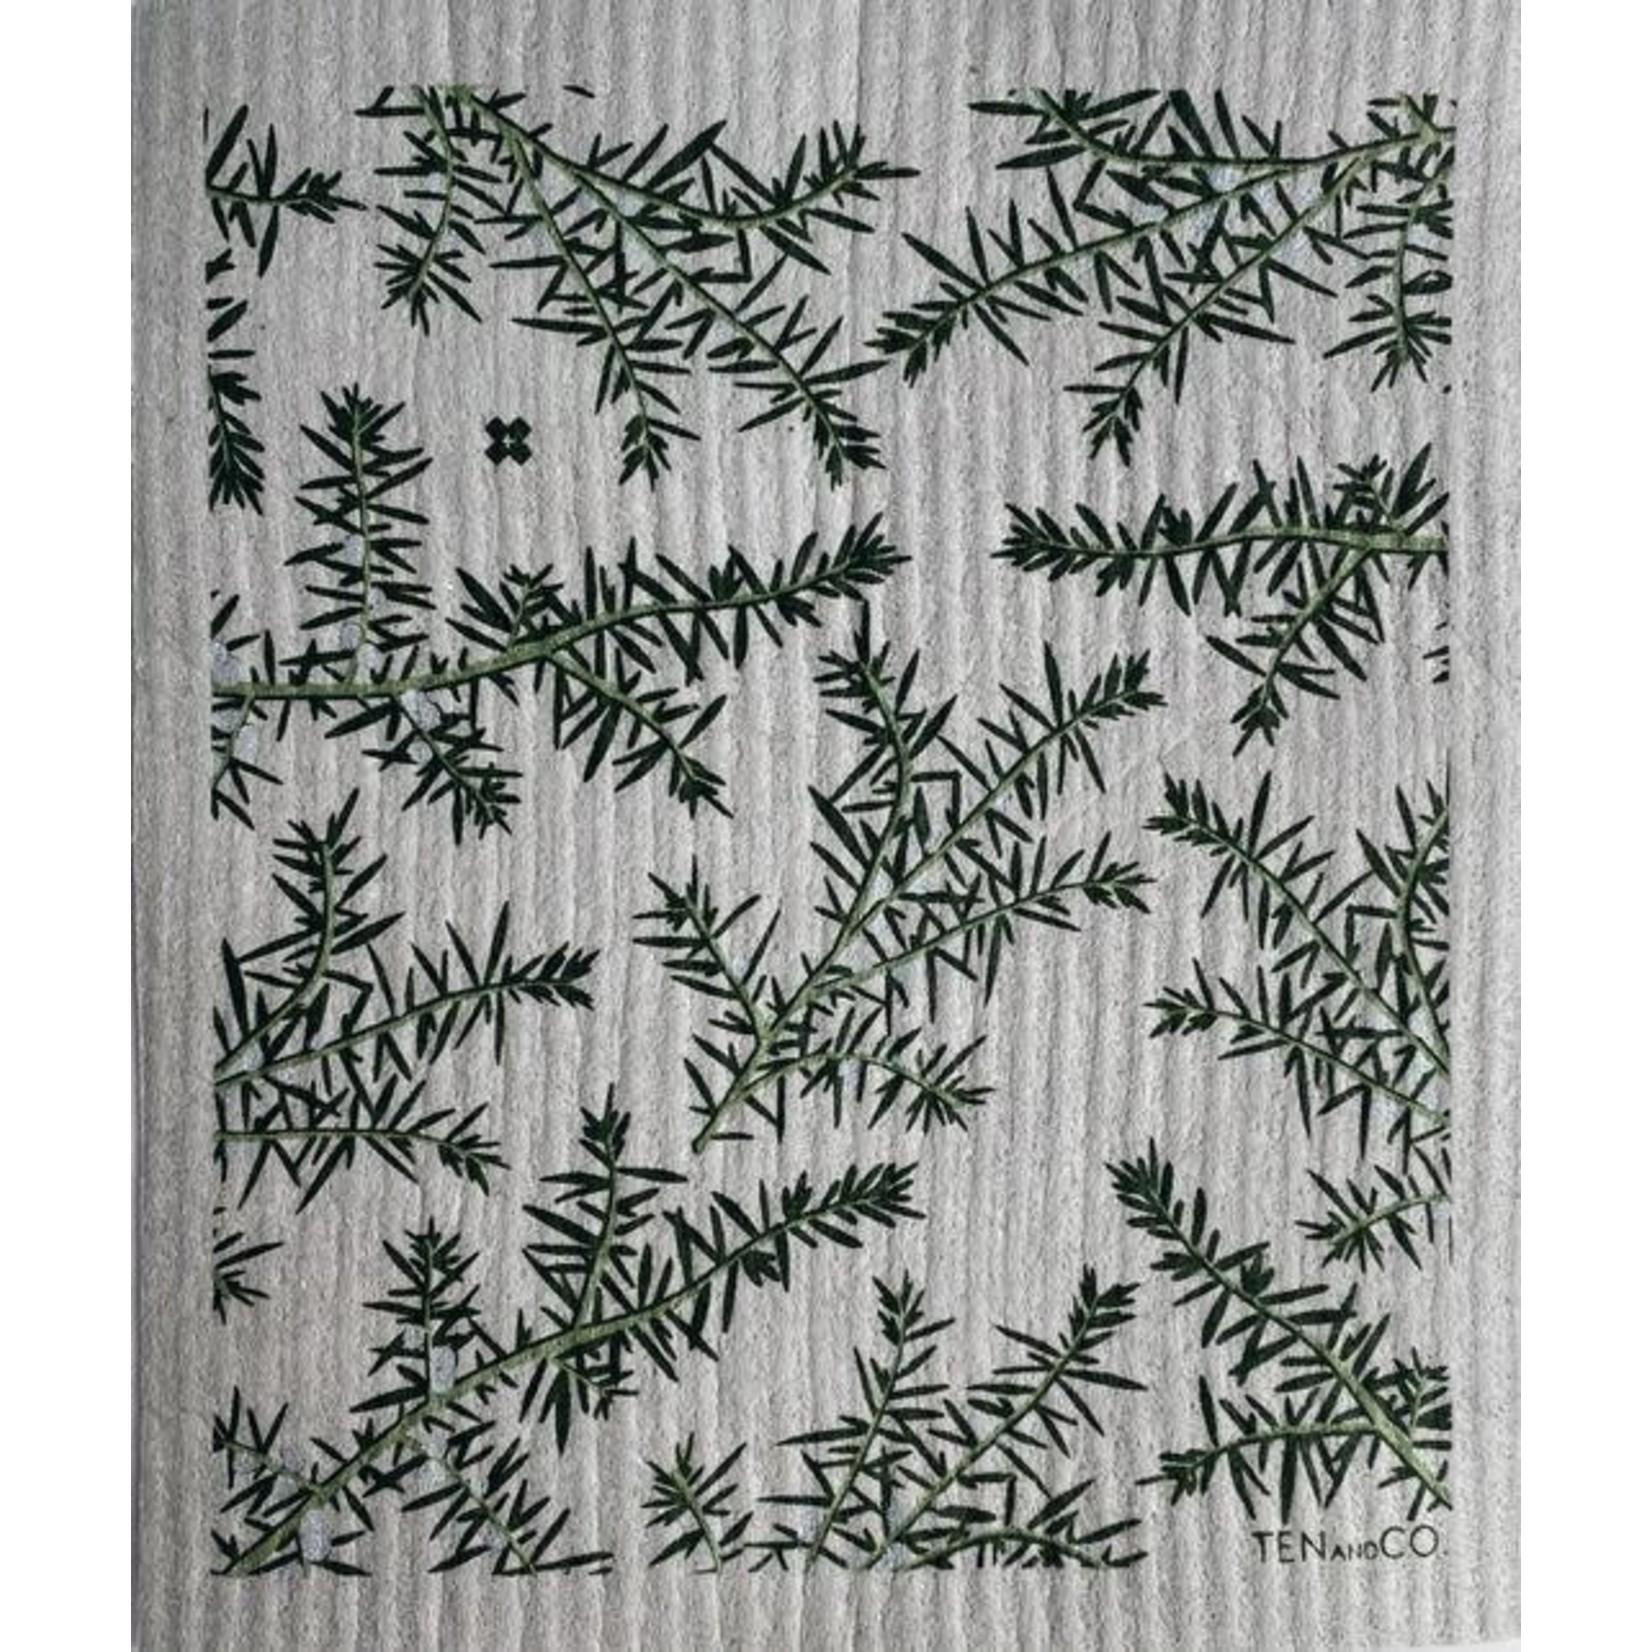 TEN AND CO. Sponge Cloth Juniper Greens on Grey